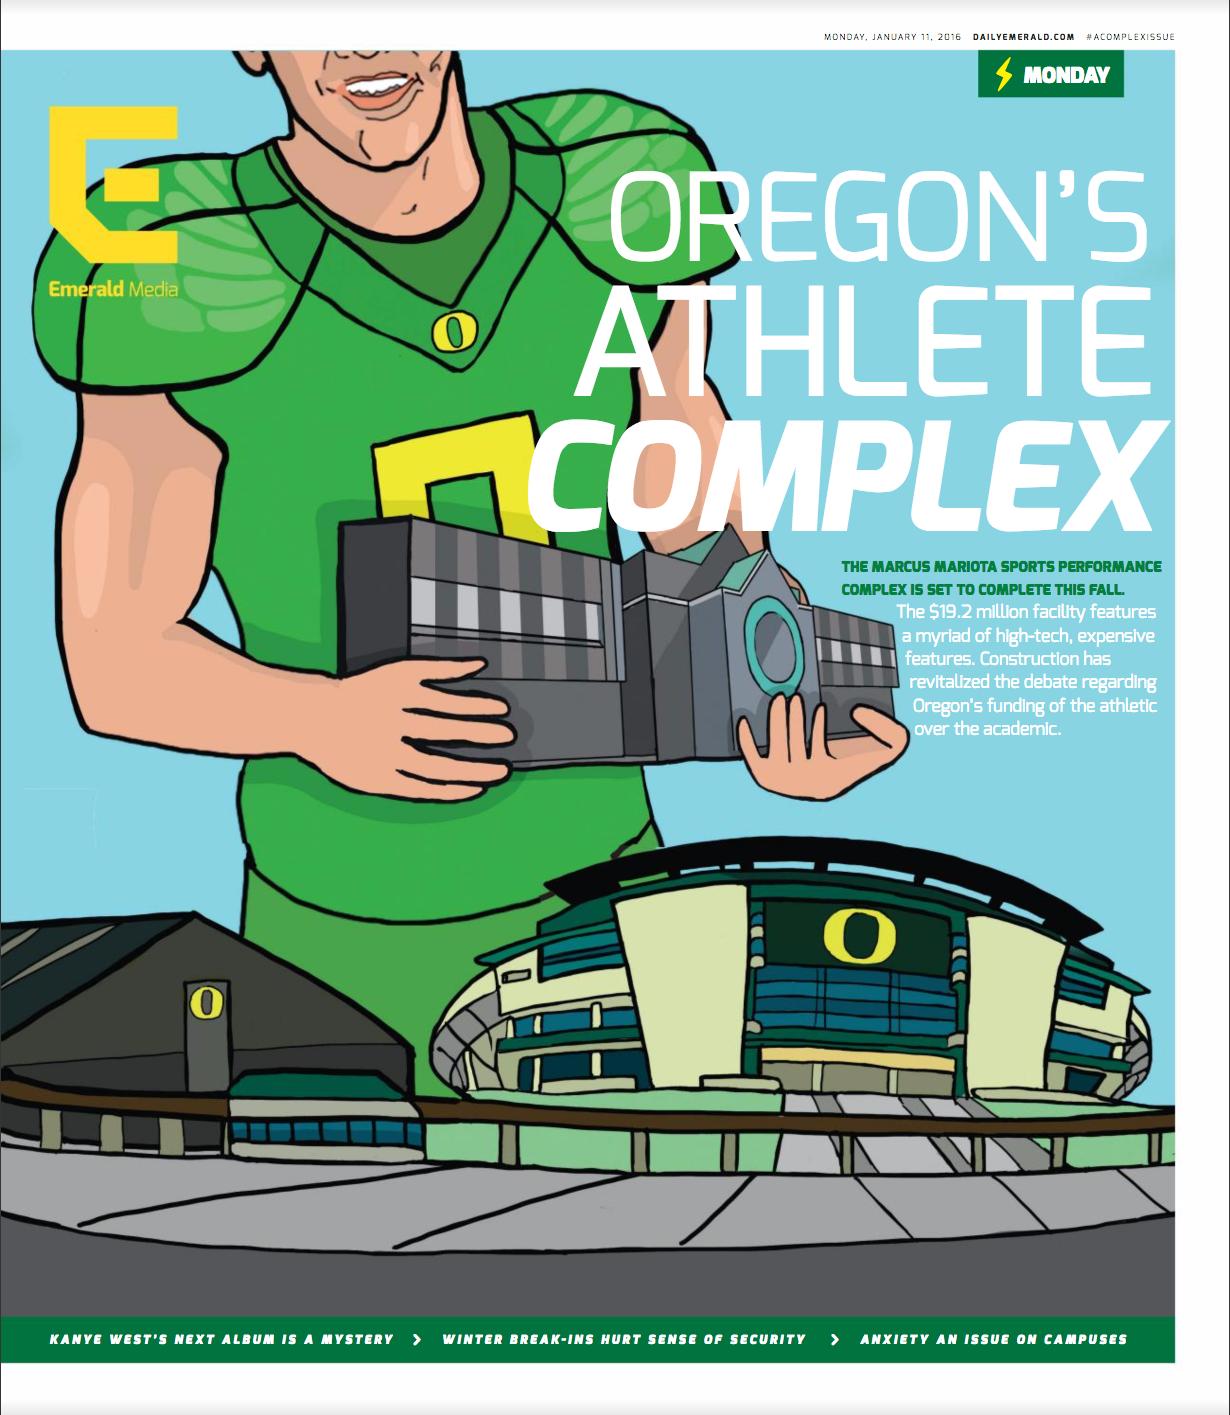 The Athlete Complex